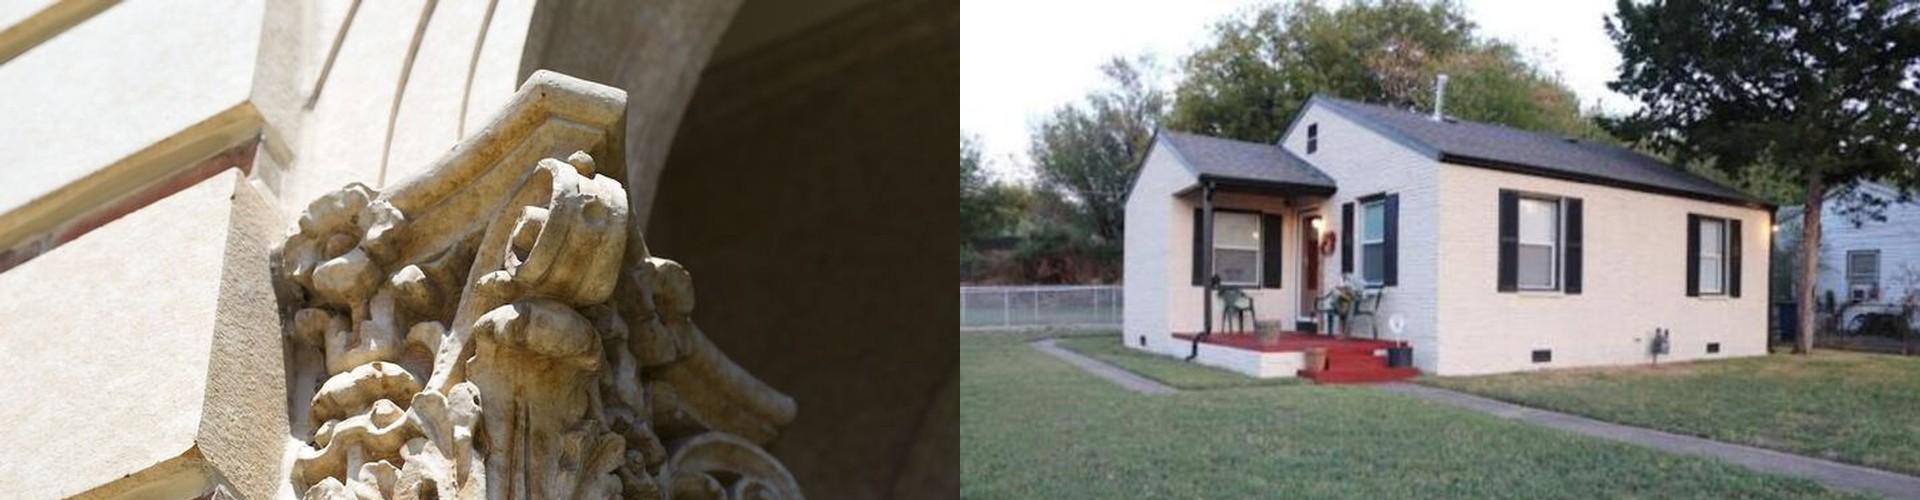 Best Tulsa Meeting Hotels - Tulsa (OK) Meeting Rooms